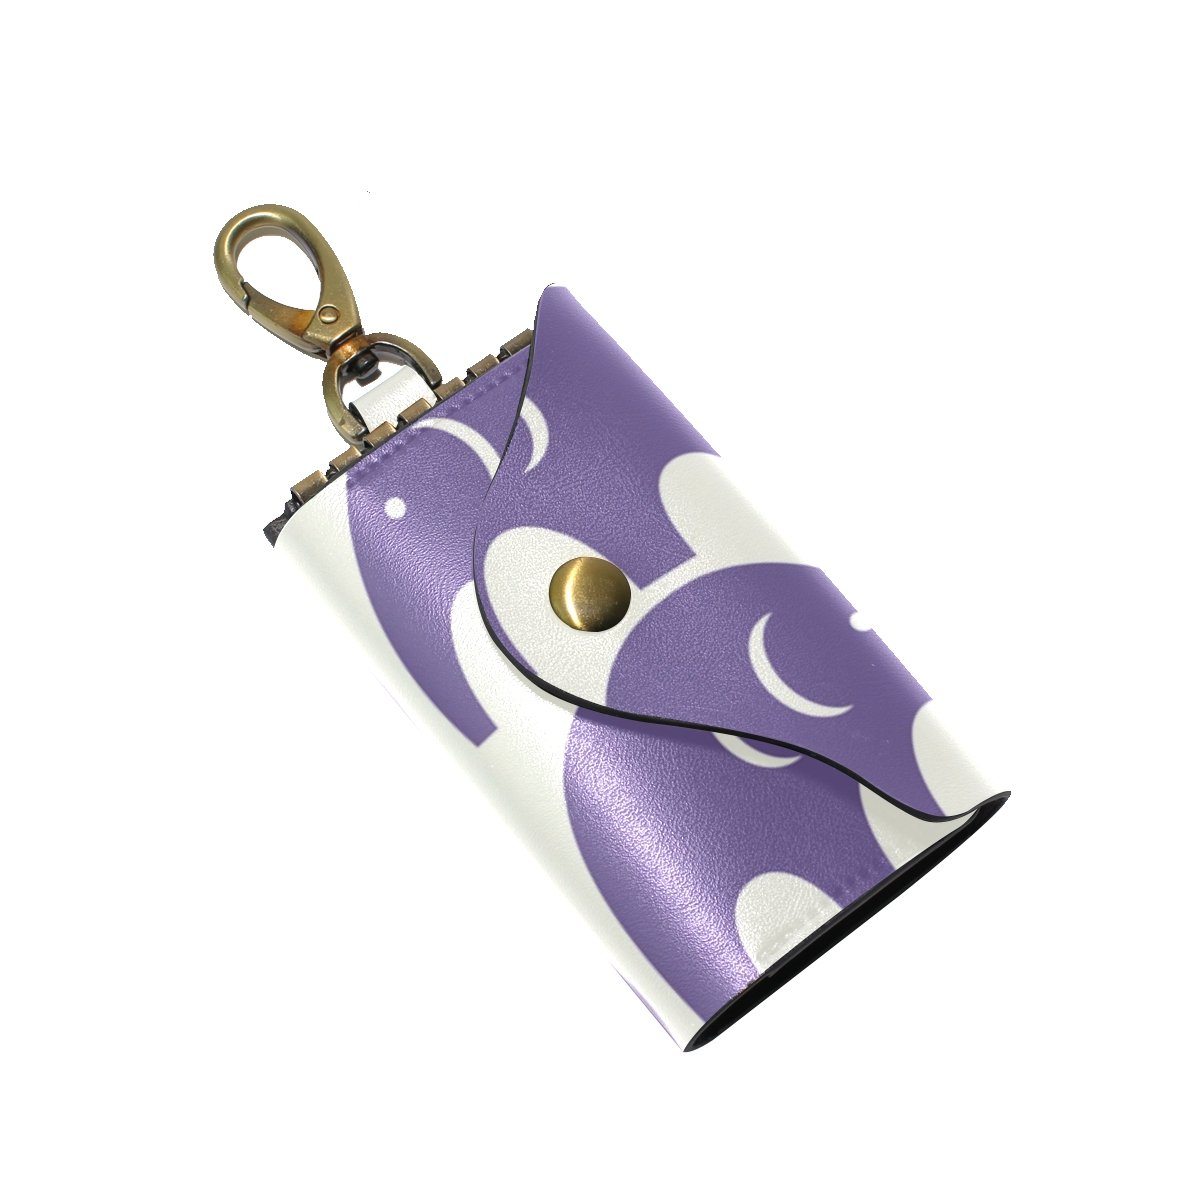 DEYYA Cute Elephant Pattern Leather Key Case Wallets Unisex Keychain Key Holder with 6 Hooks Snap Closure